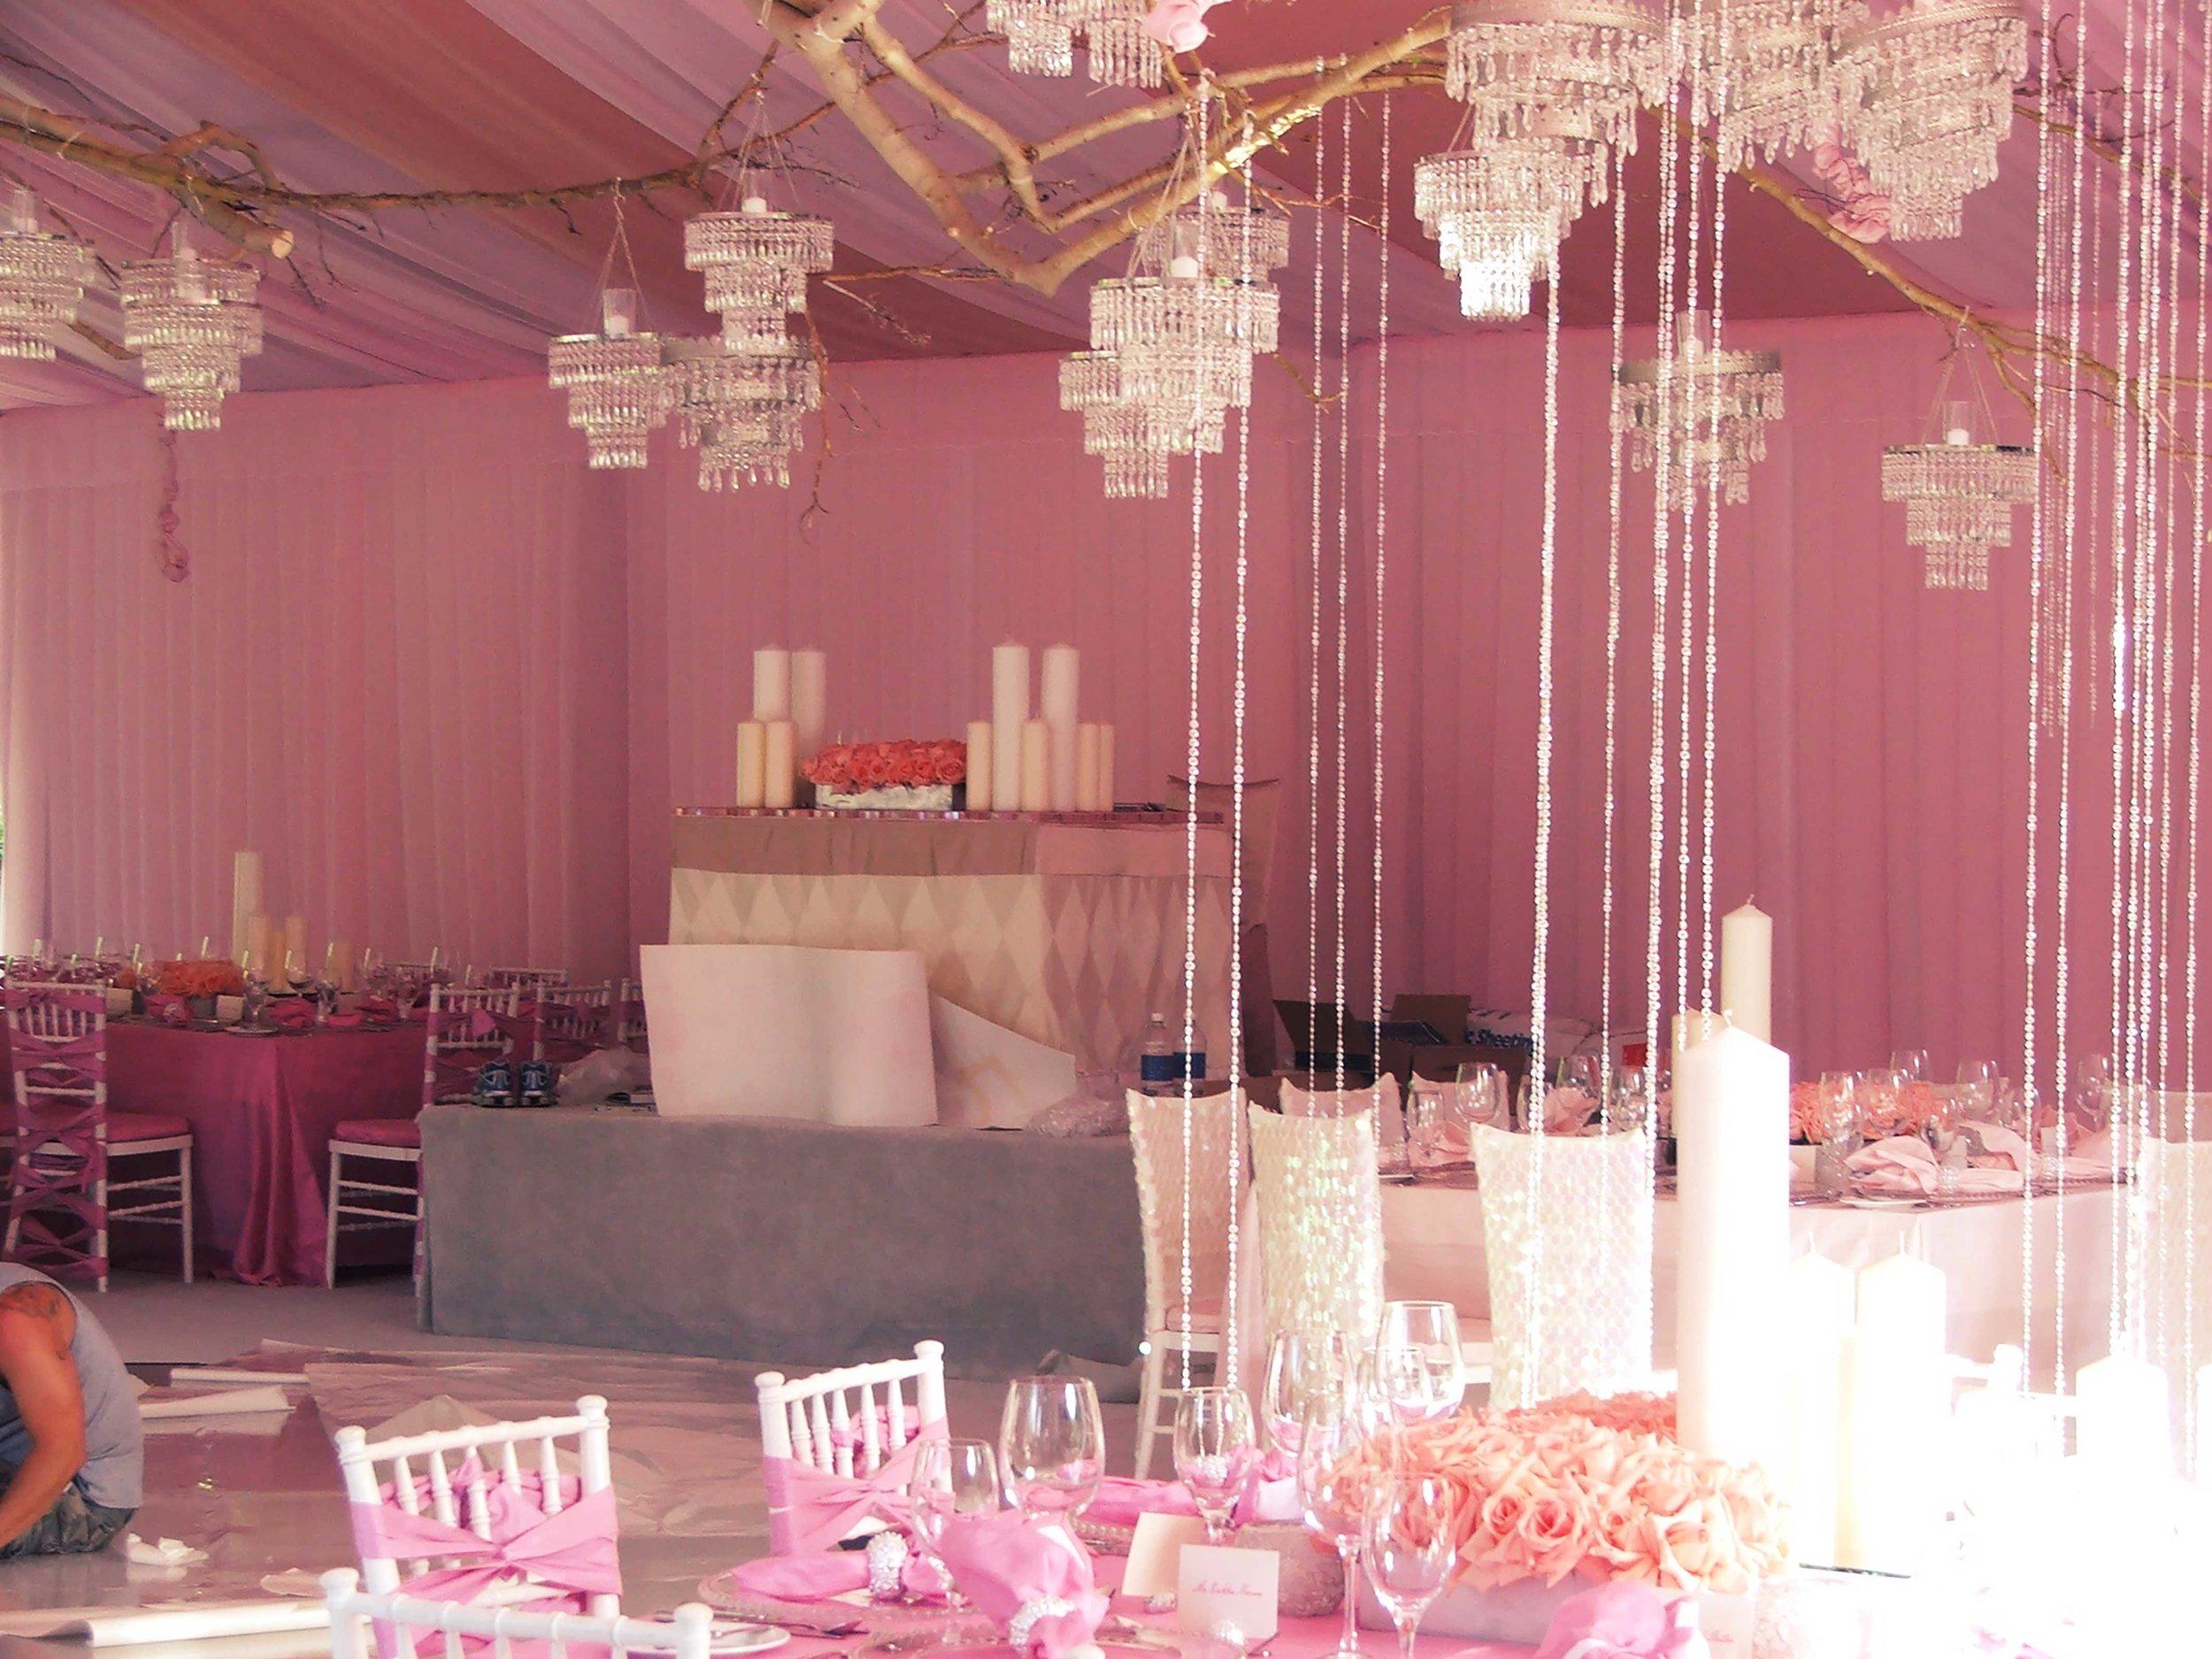 OC-Pink-Decor-1.jpg